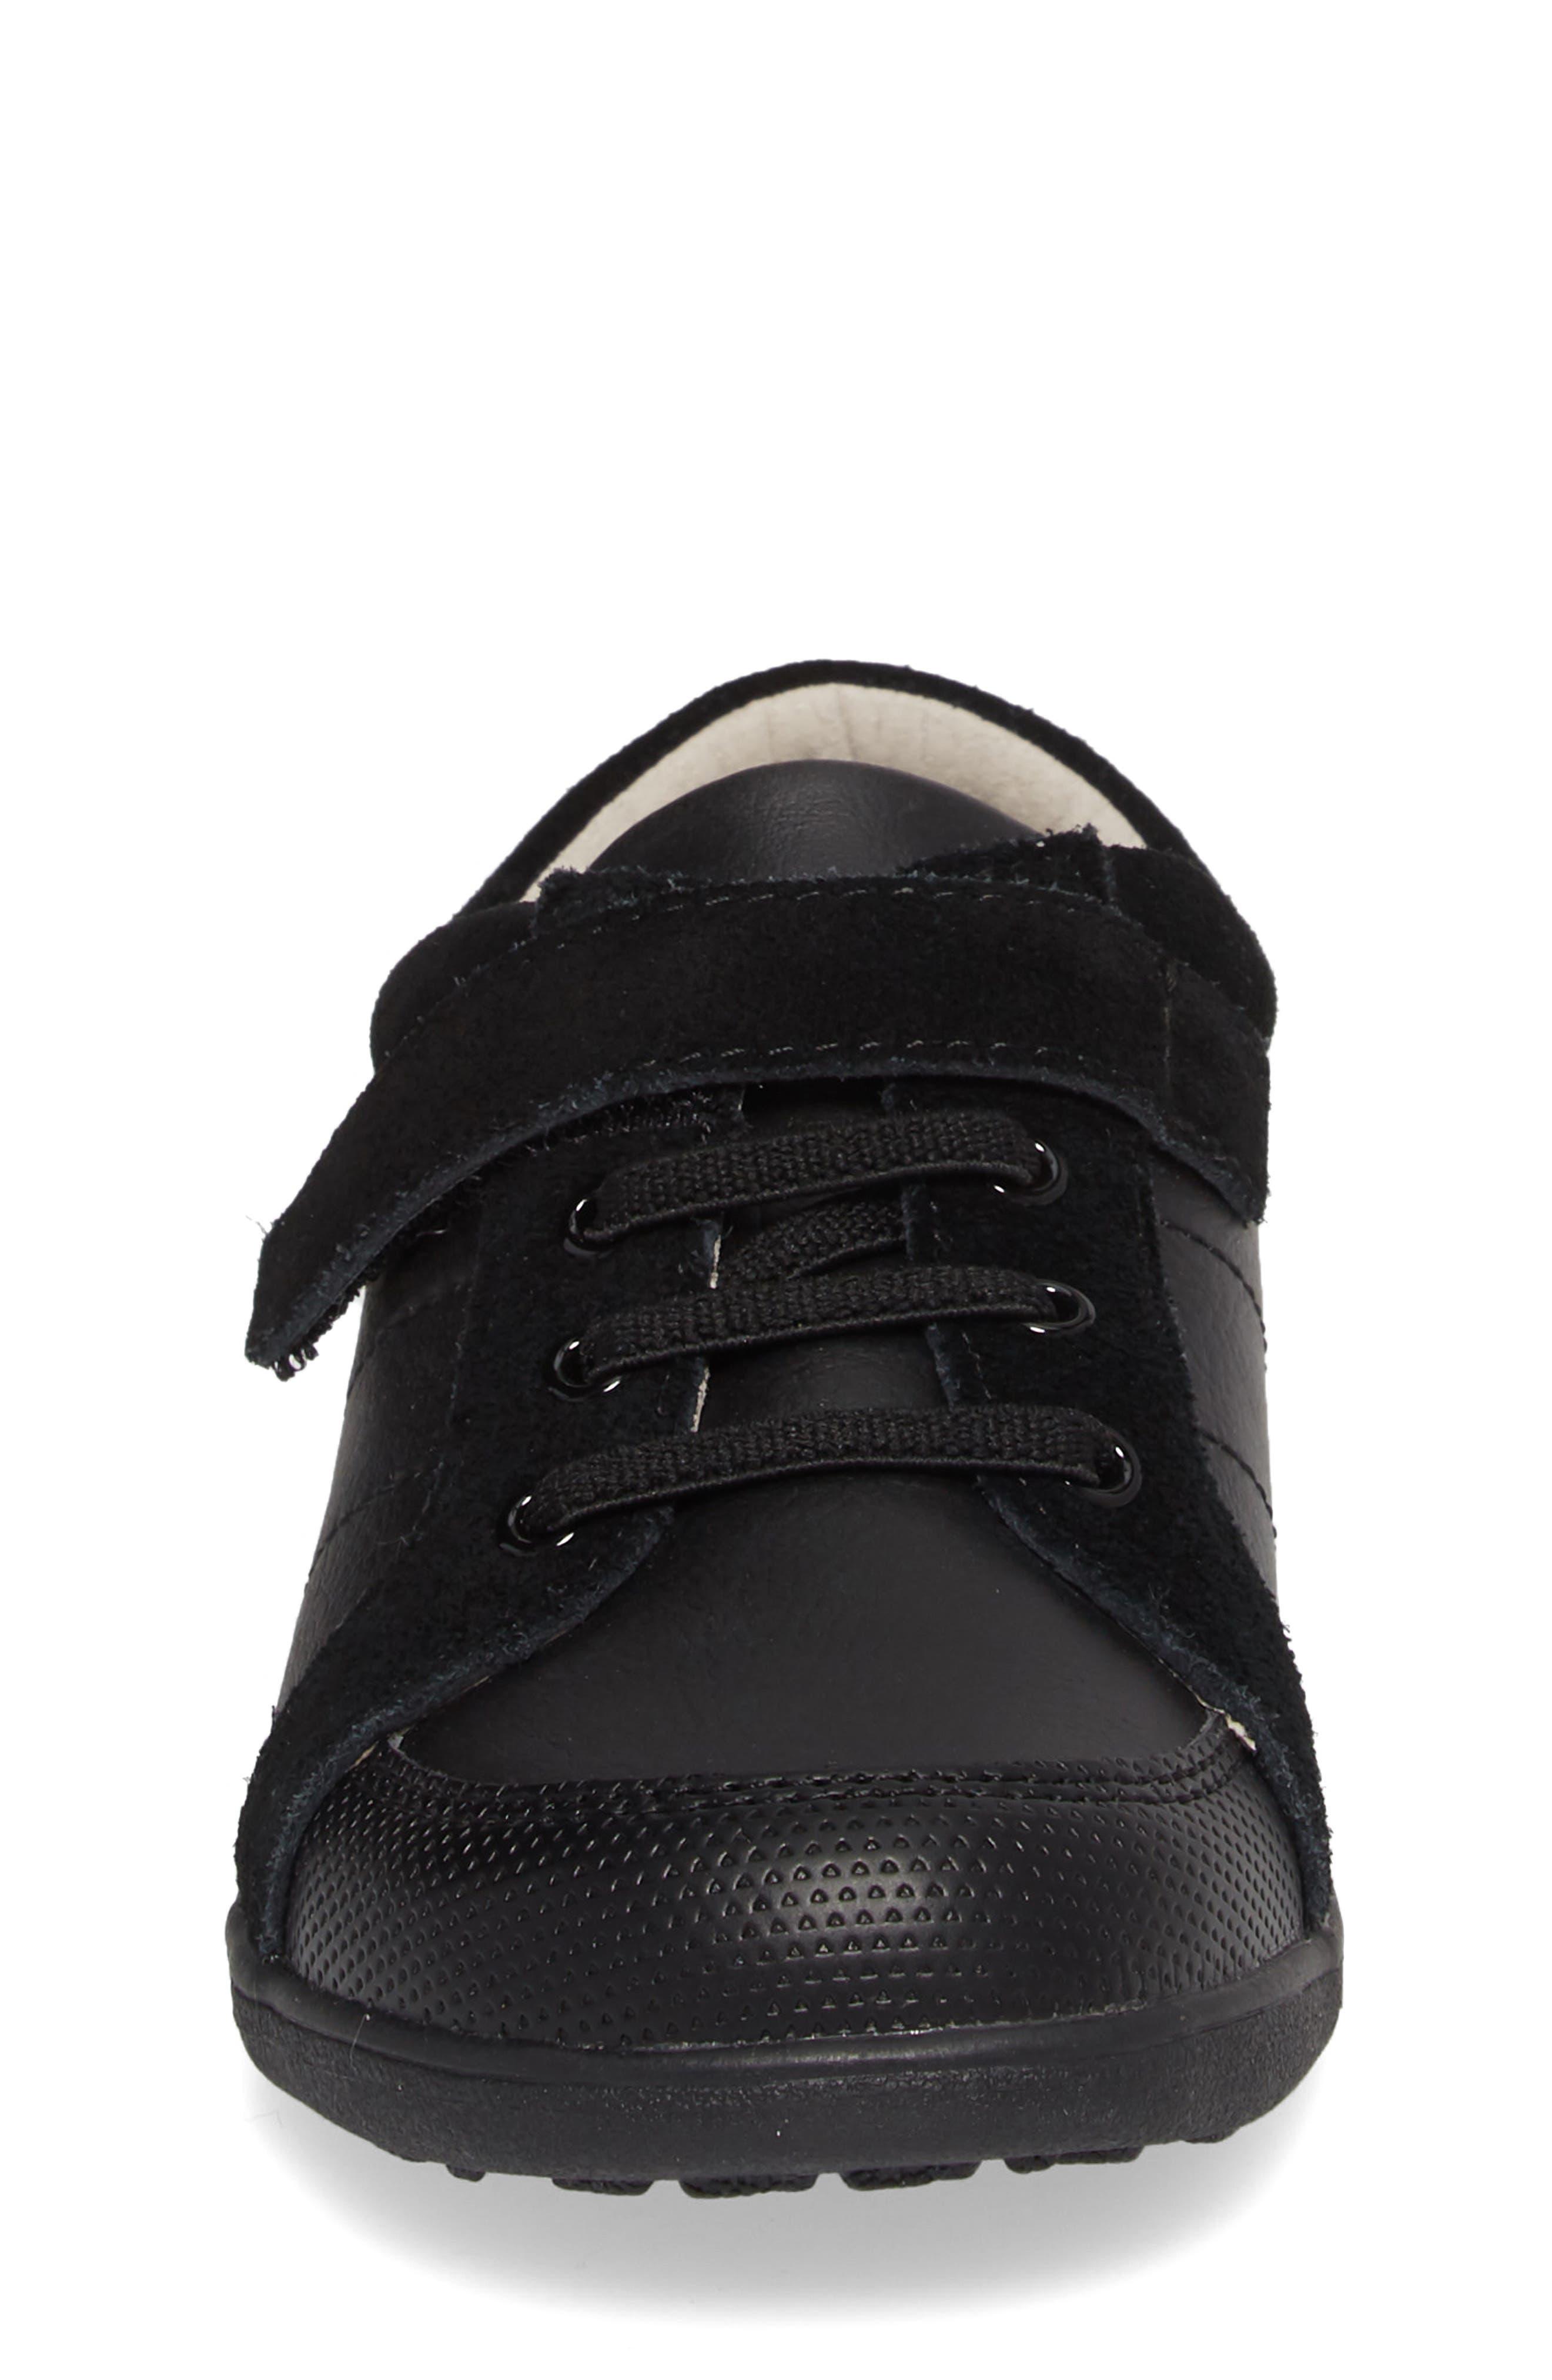 Randal III Sneaker,                             Alternate thumbnail 3, color,                             Black